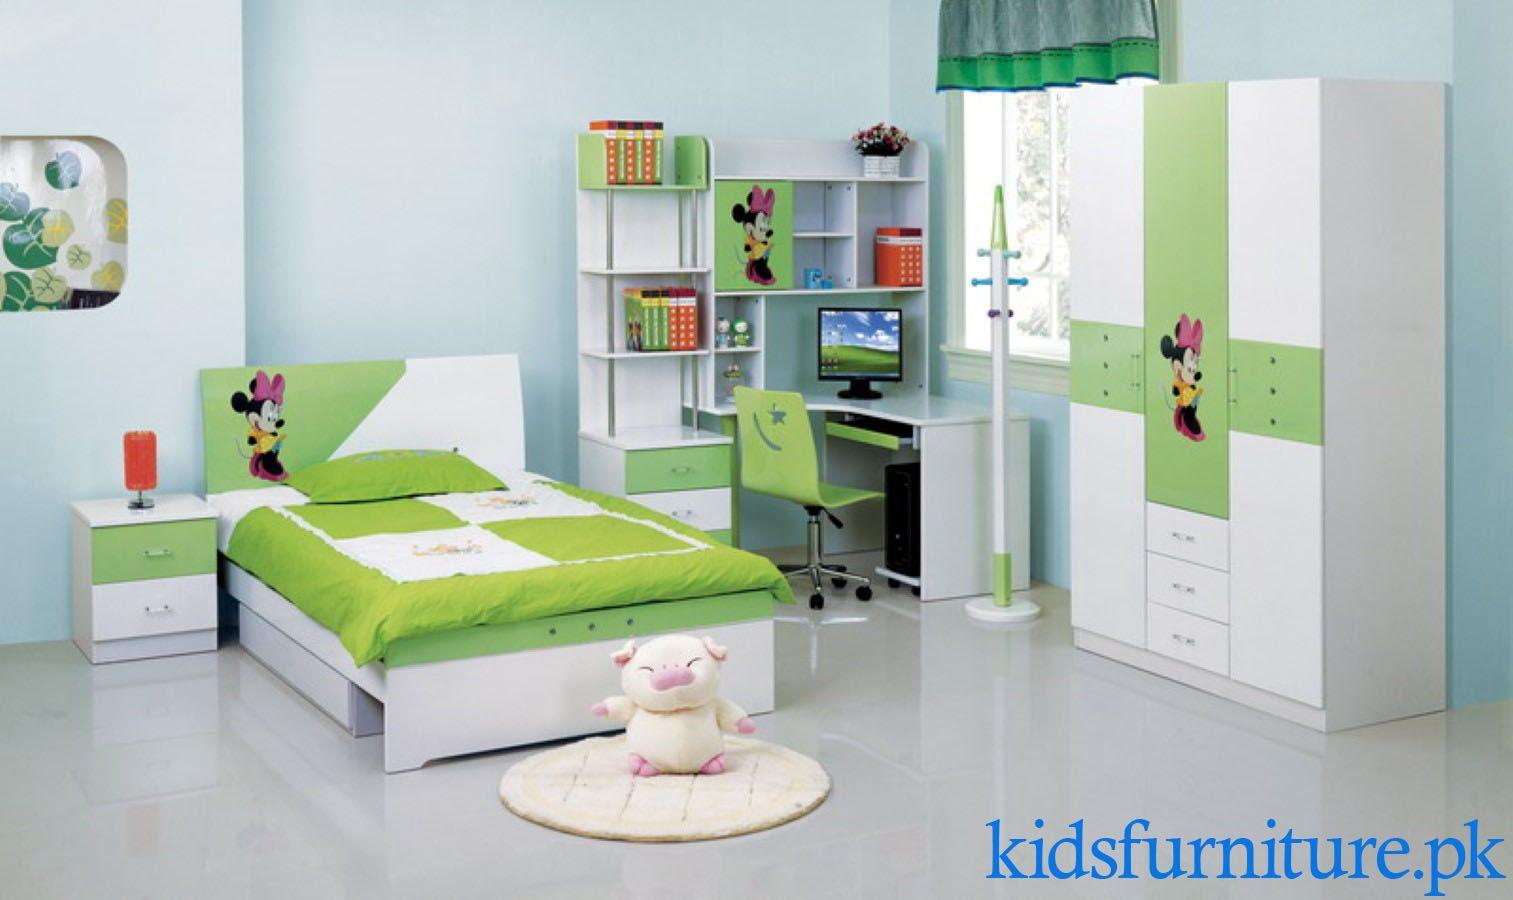 things cupboard york stores furniture children model best s consider modern kids design of minimalist ideas store to new when kid